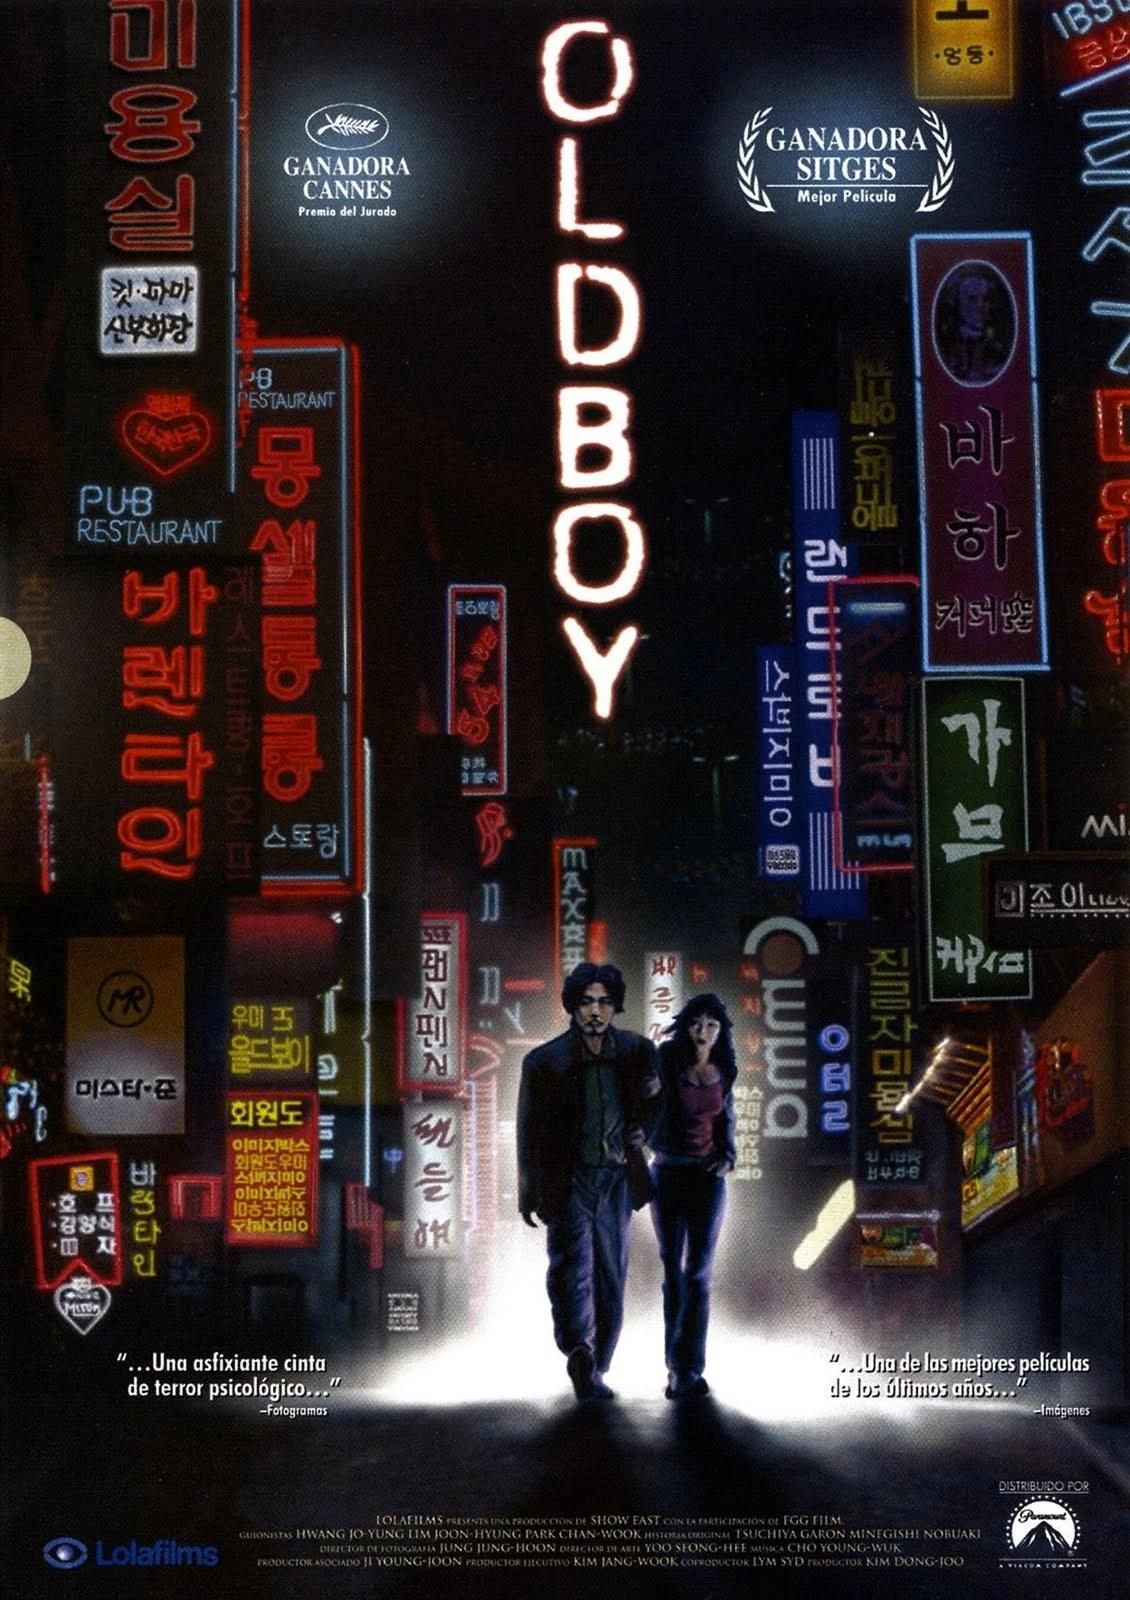 Ji Chang Wook Hd Wallpaper Oldboy 2003 Cinemorgue Wiki Fandom Powered By Wikia